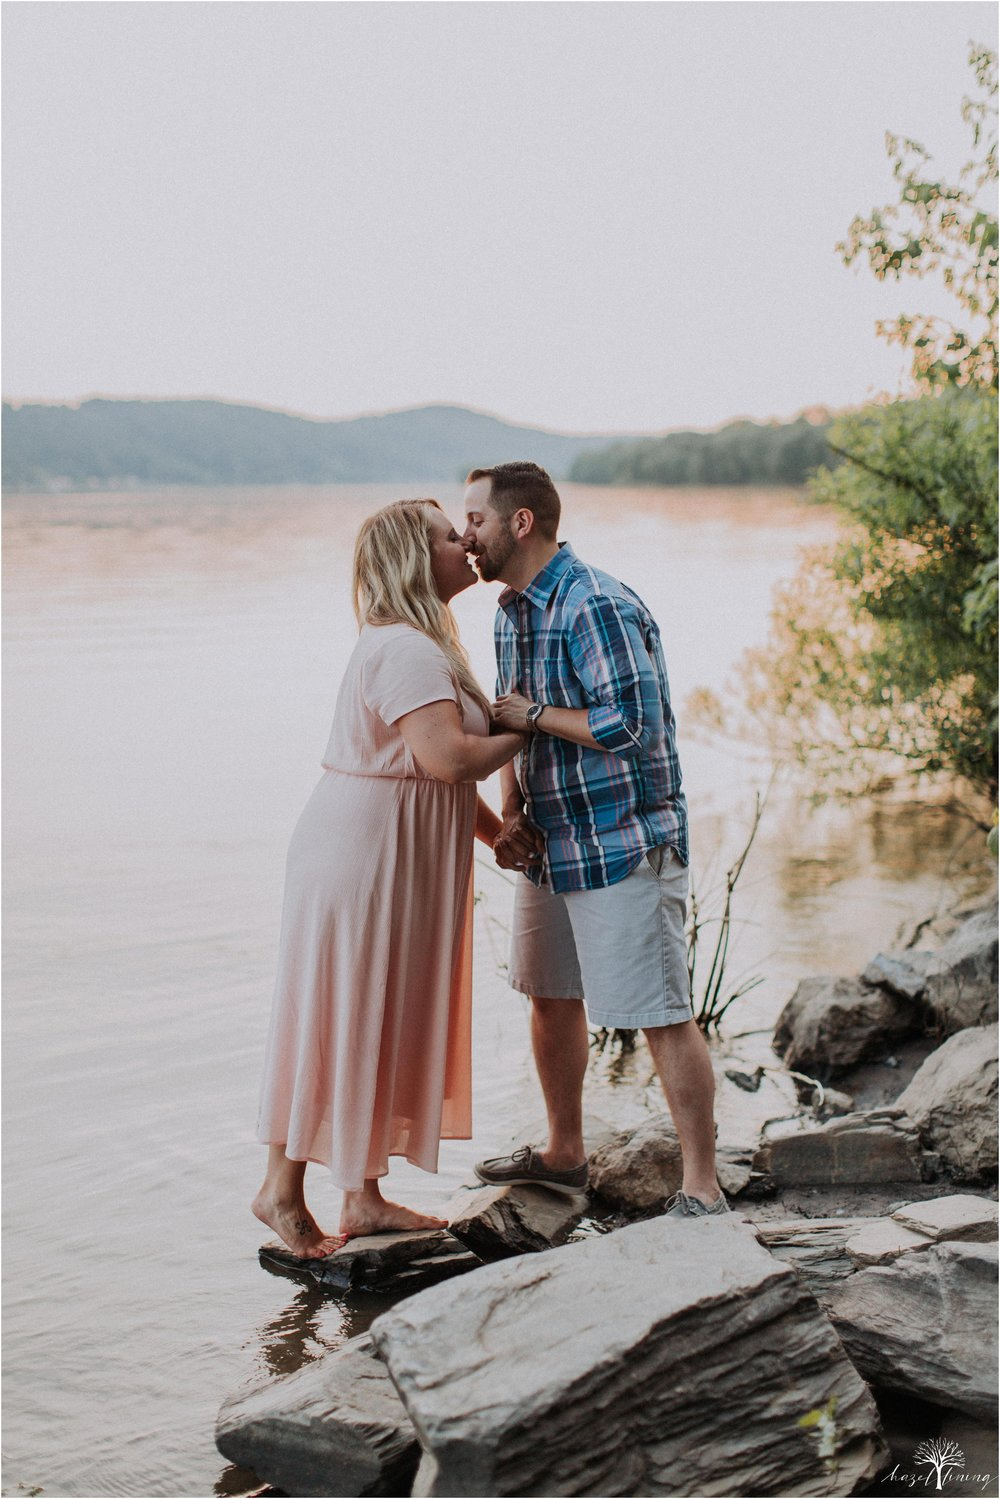 mel-mnich-john-butler-marietta-furnace-engagement-session-lancaster-county-pennsylvania-hazel-lining-travel-wedding-elopement-photography_0264.jpg